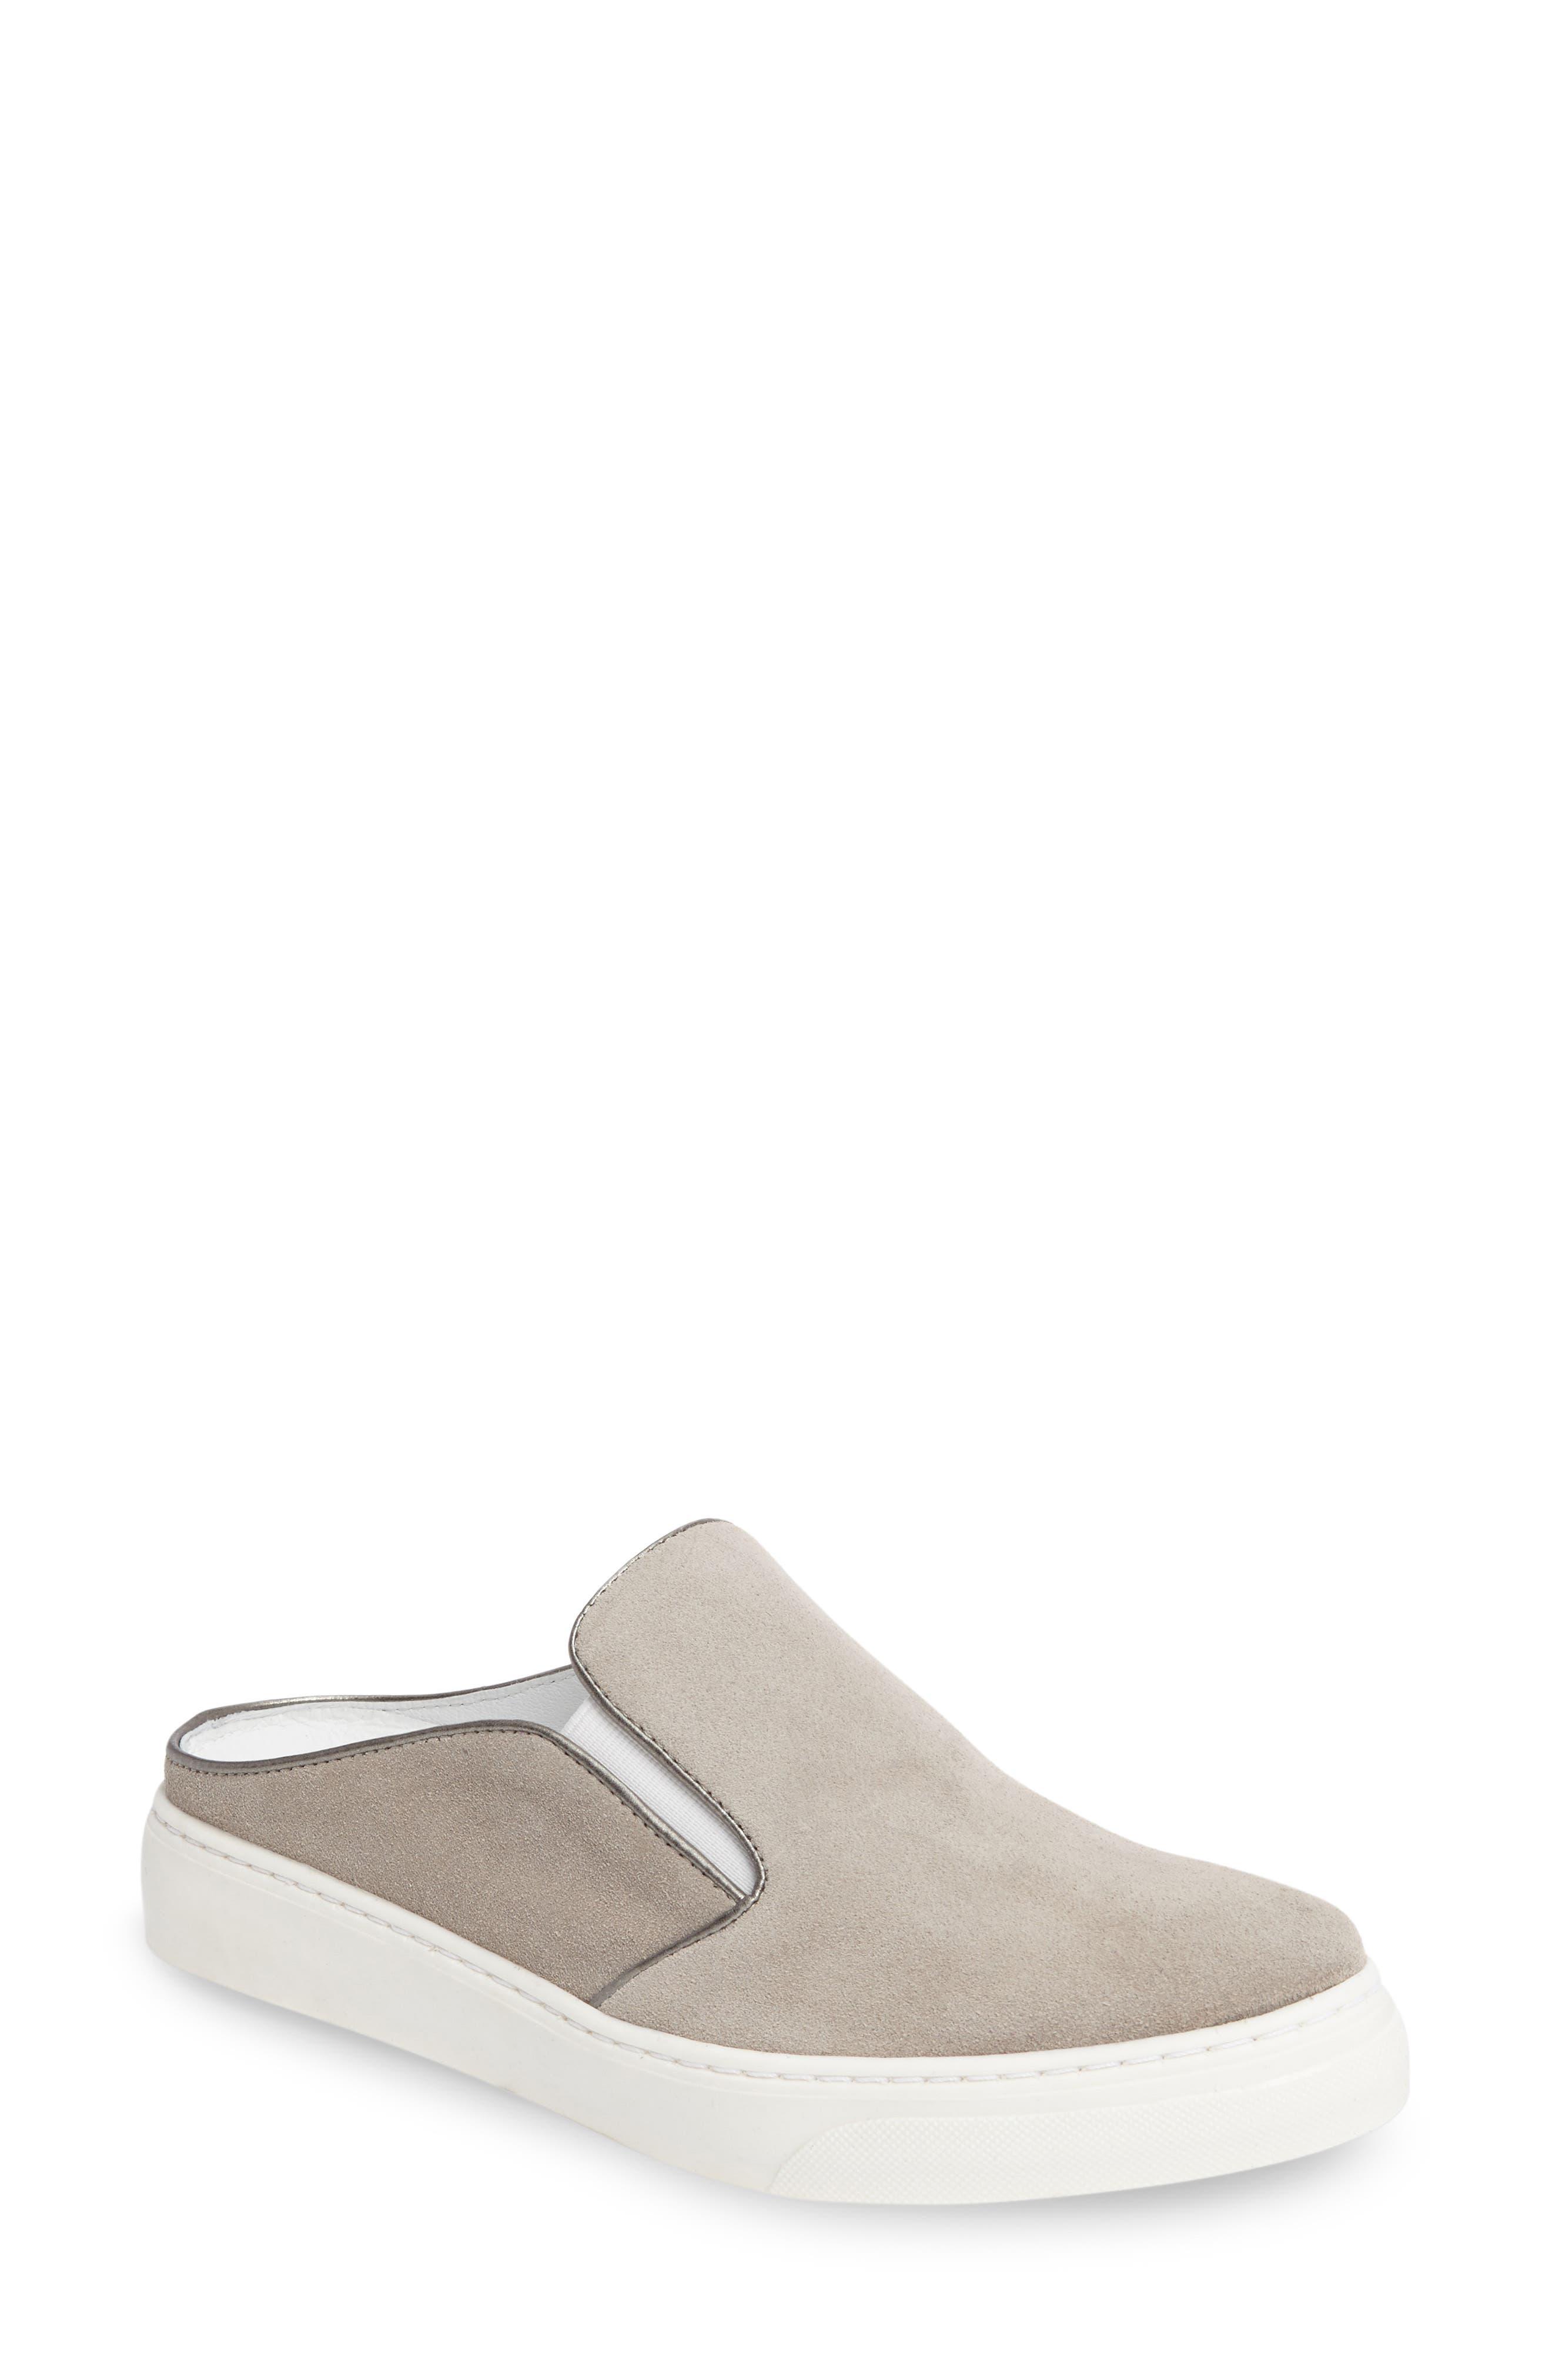 Balbina Mule Sneaker,                             Main thumbnail 2, color,